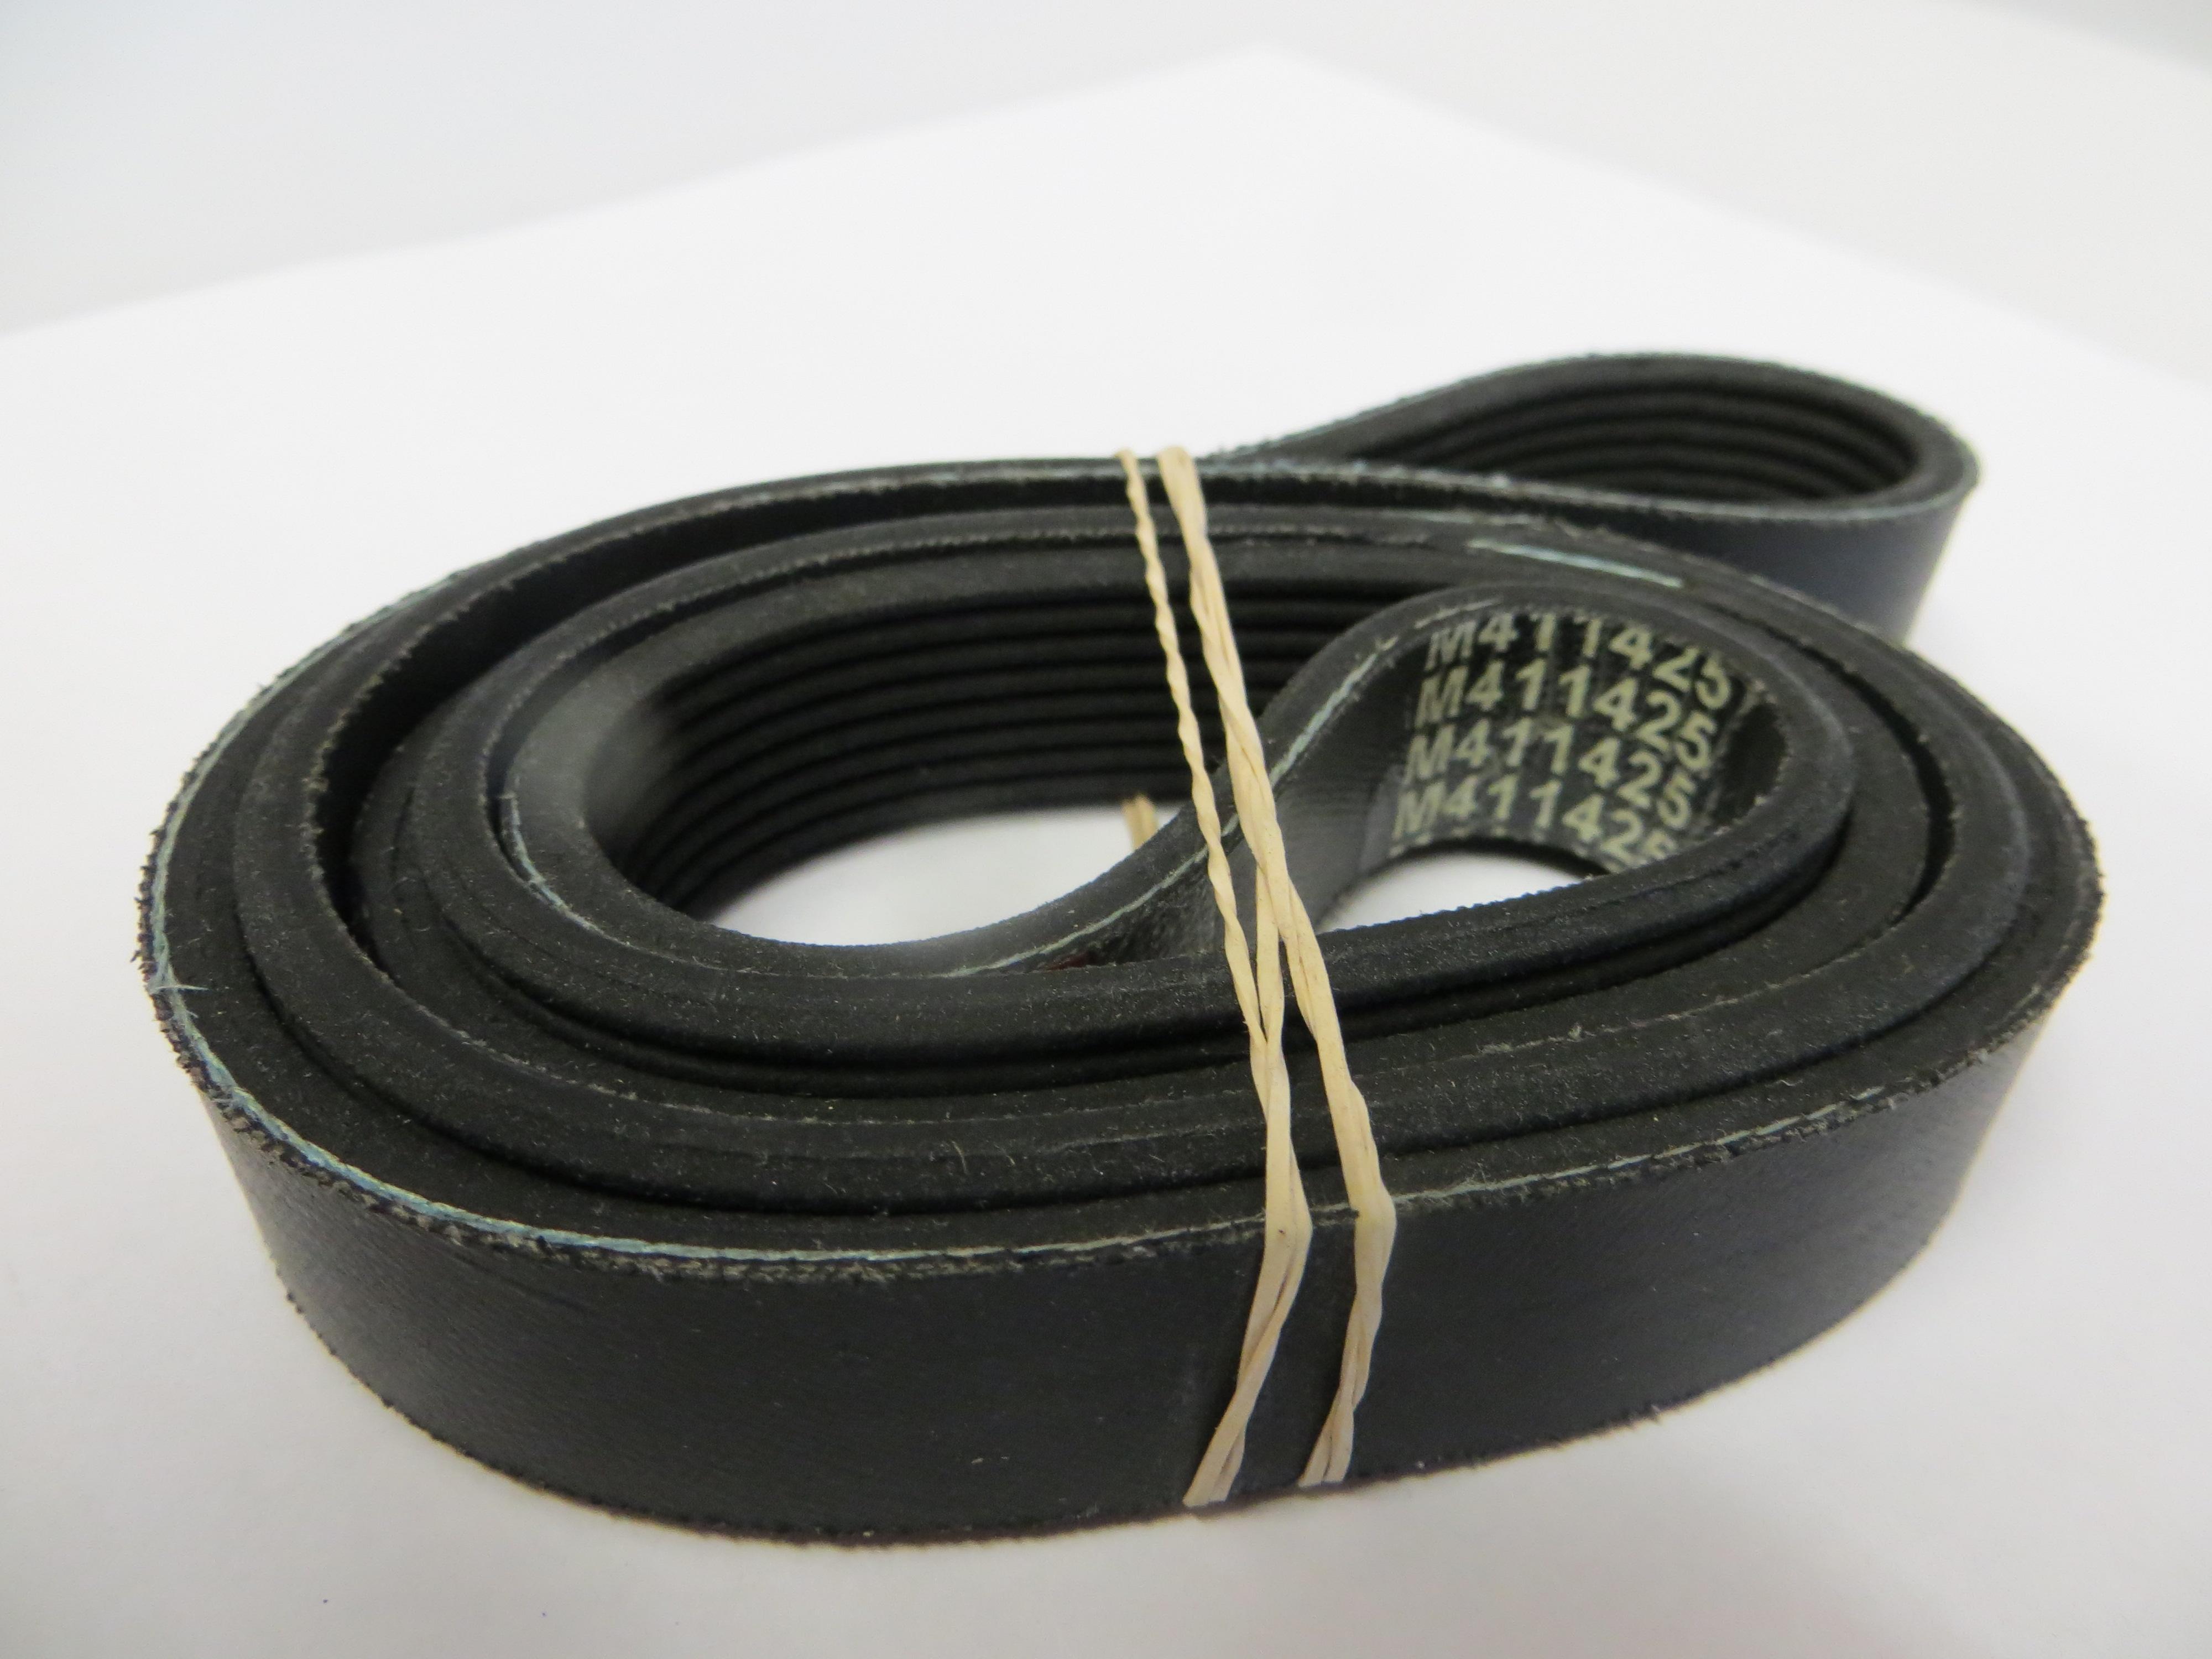 M411425 Generic 45 Micro V Belt